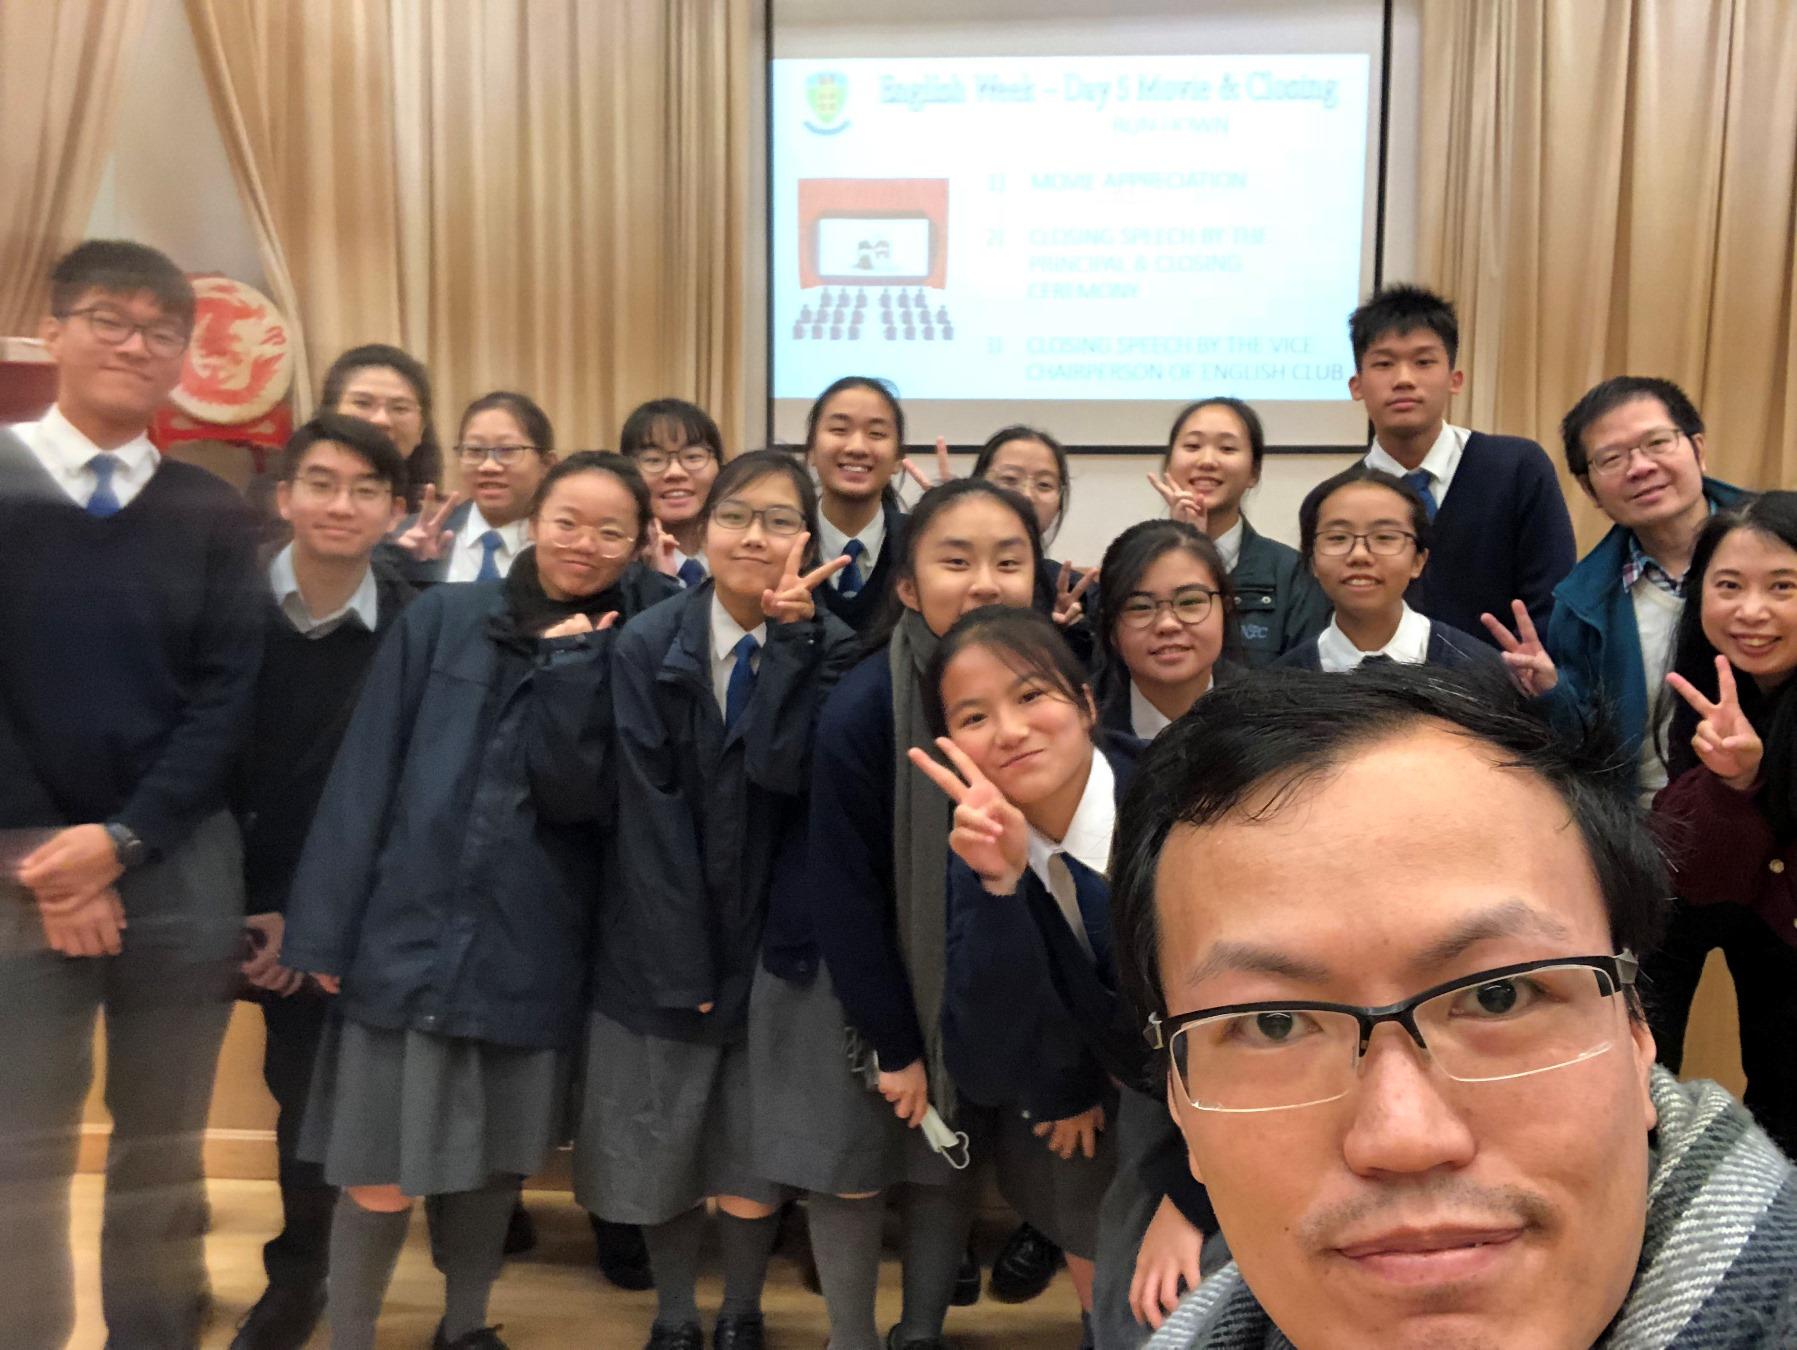 http://npc.edu.hk/sites/default/files/img_9857.jpg